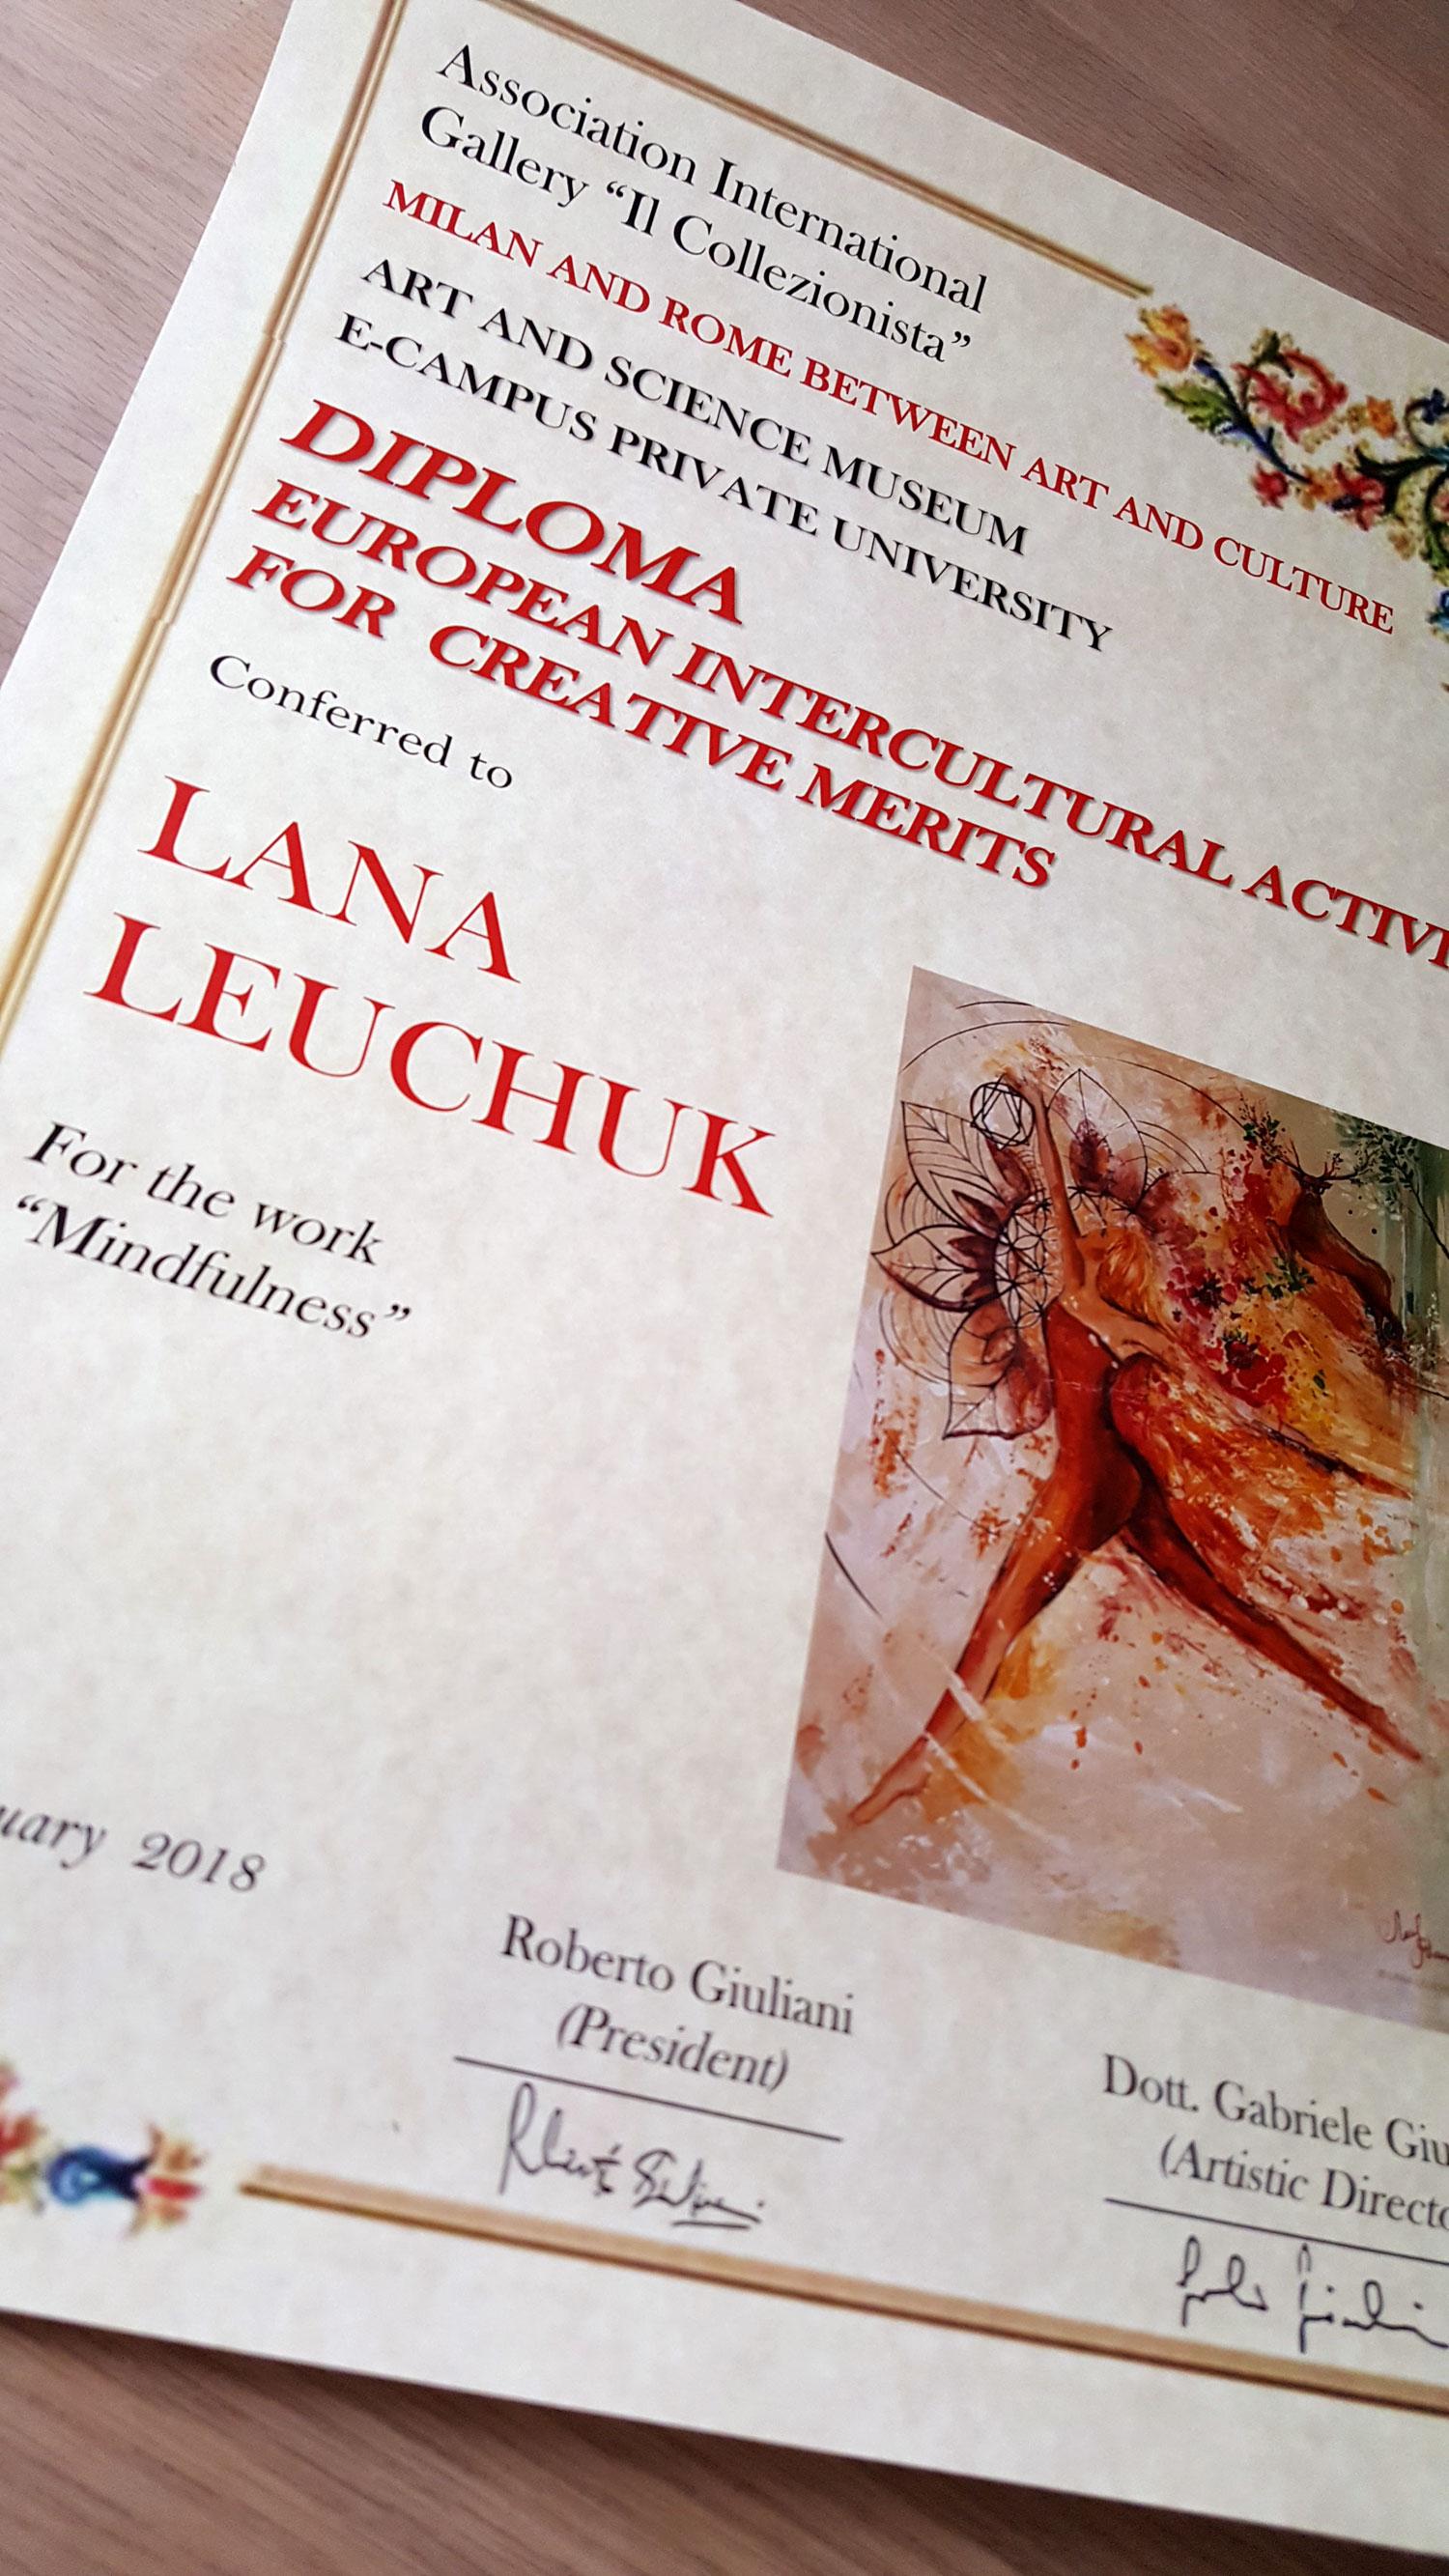 diploma-gallery-rome-artist-lana-leuchuk